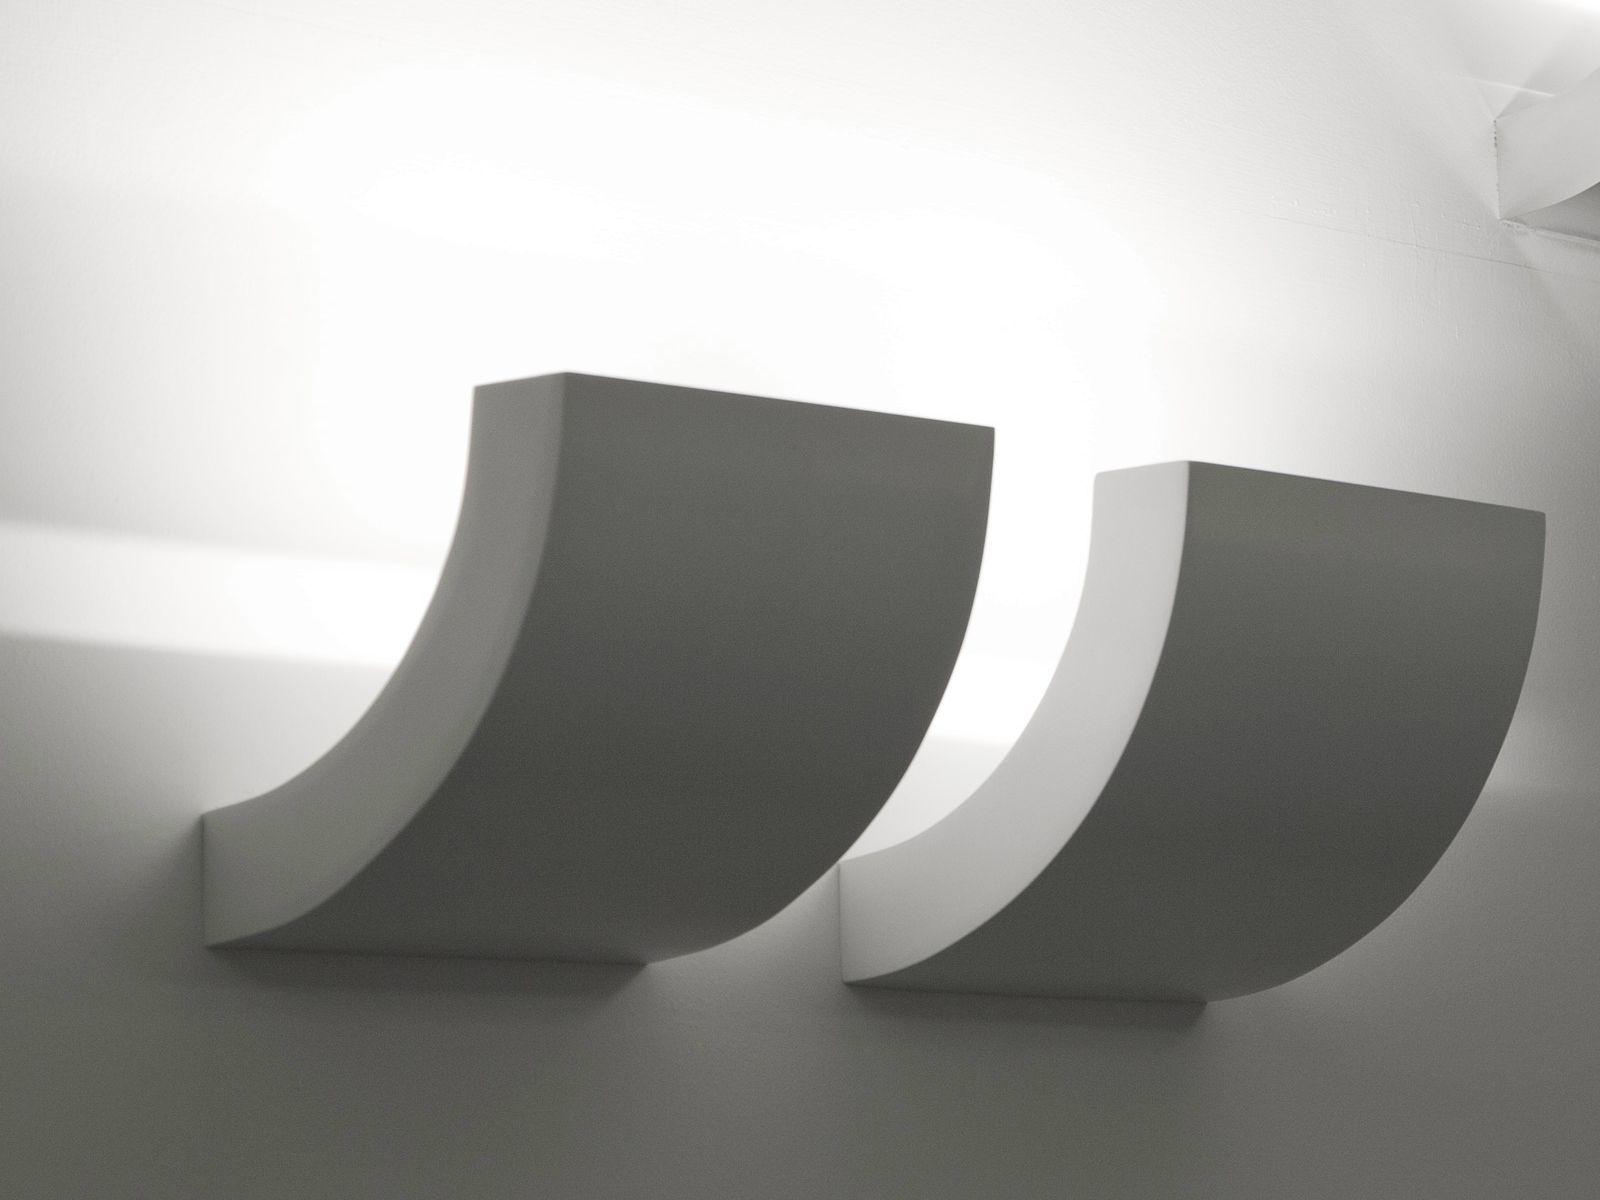 design indirect light halogen aluminium wall lamp picchio. Black Bedroom Furniture Sets. Home Design Ideas